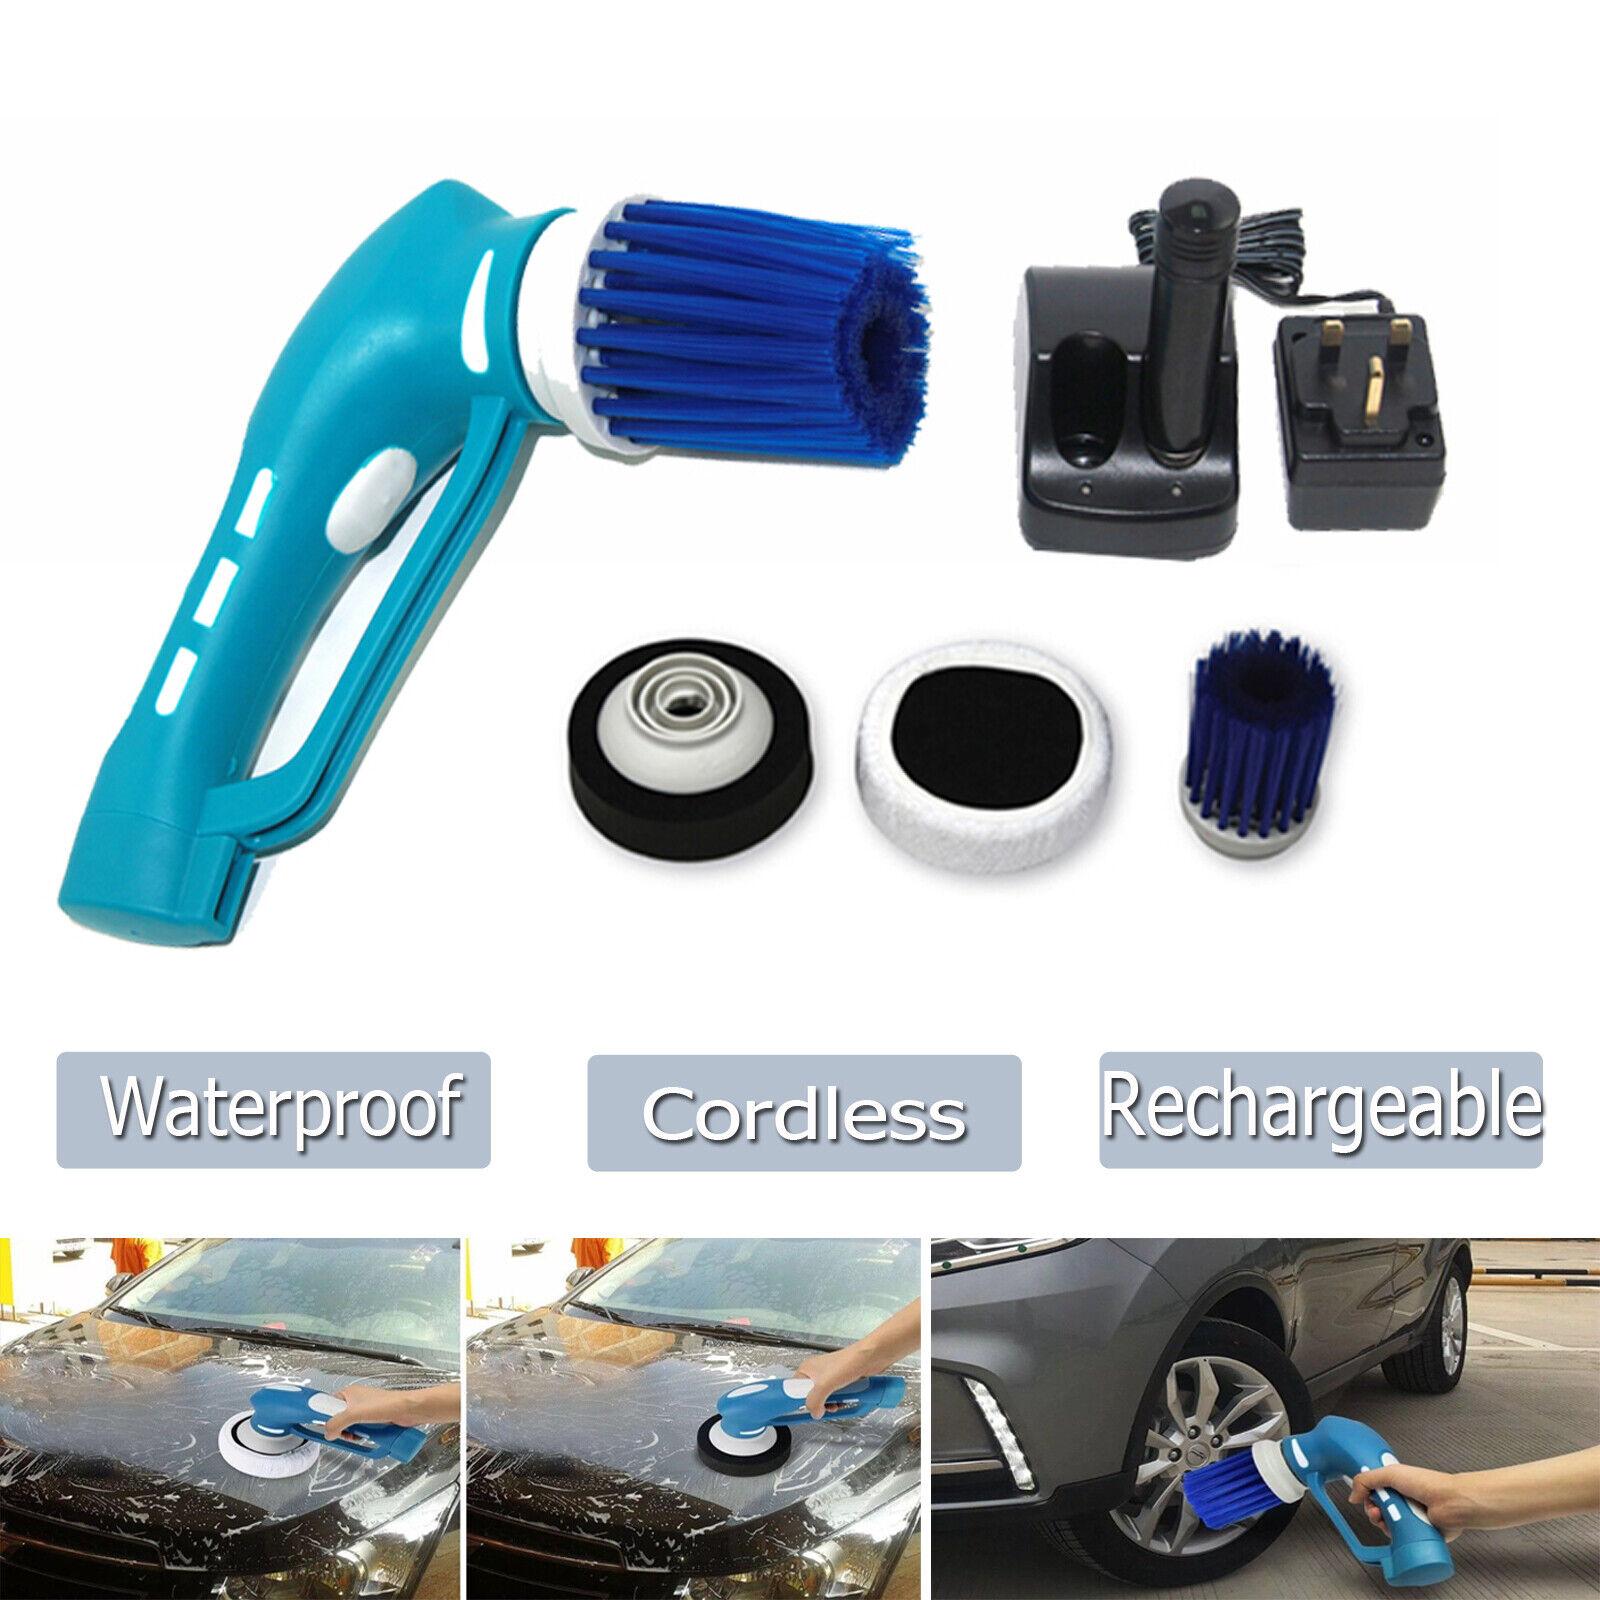 Car Polishing Mini Cordless Polisher Handheld Electric Cleaner Machine Waterprof